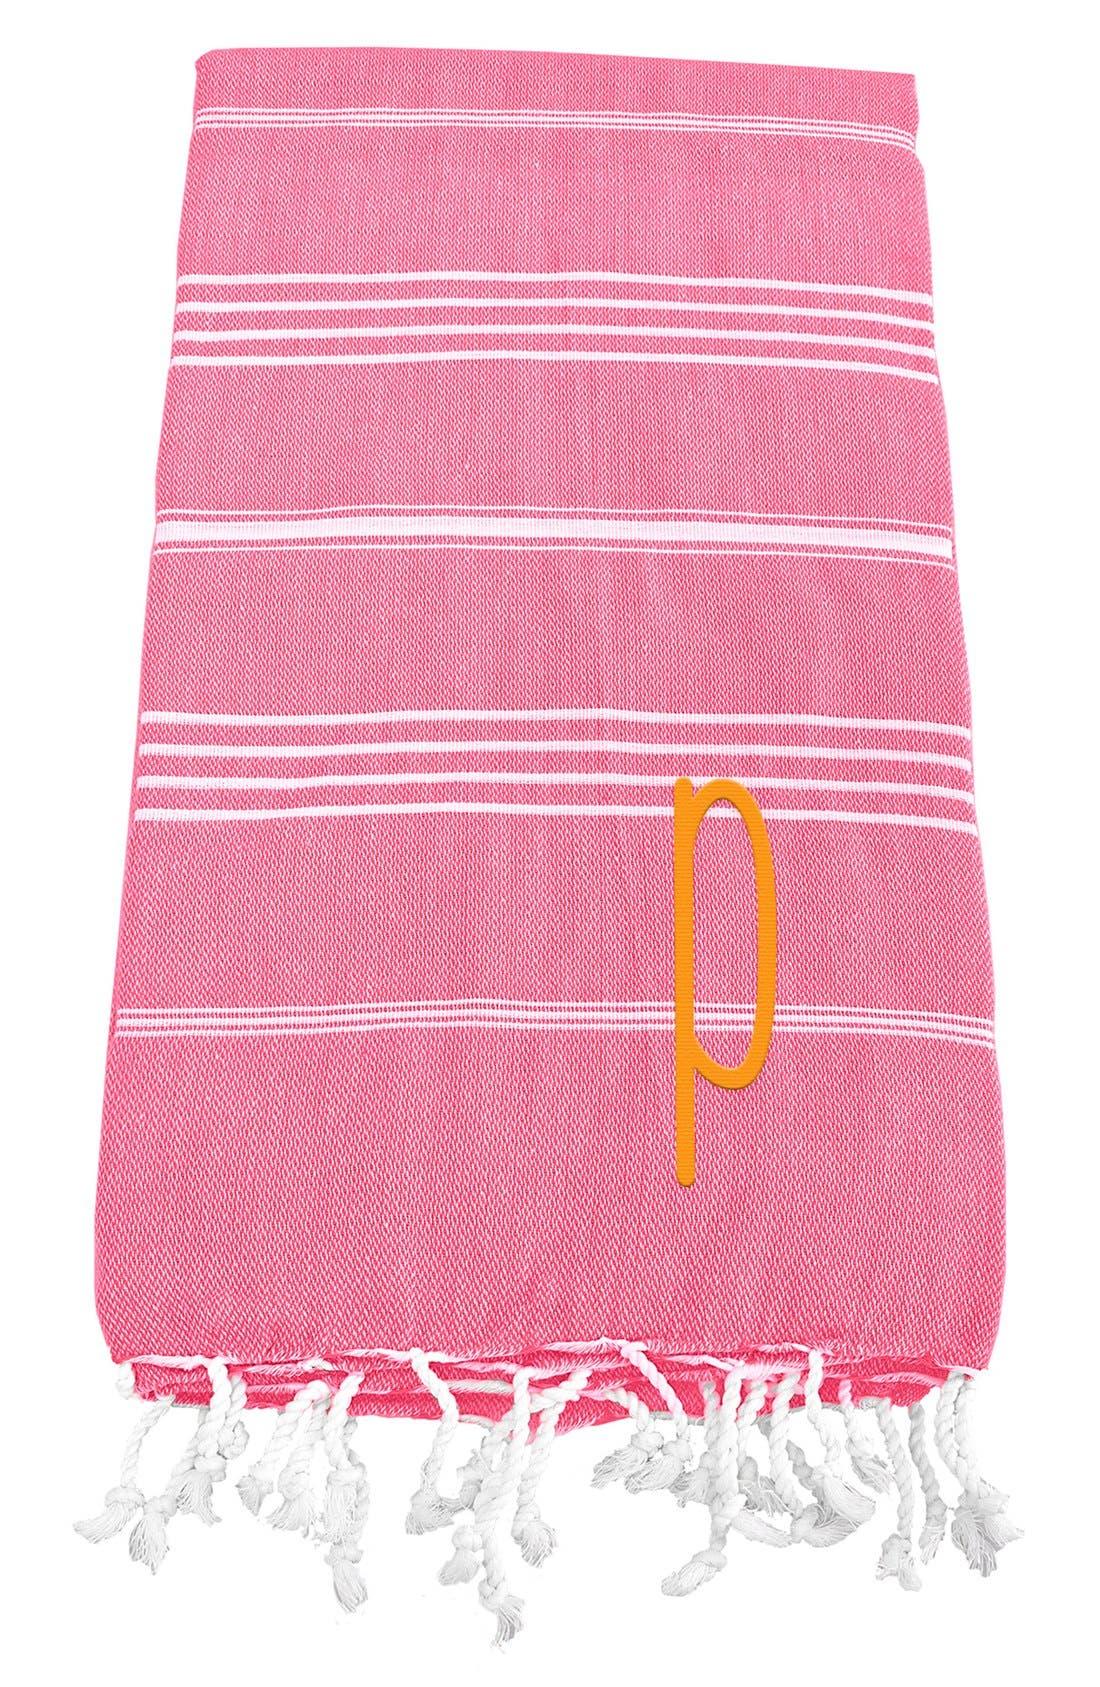 Monogram Turkish Cotton Towel,                             Main thumbnail 152, color,